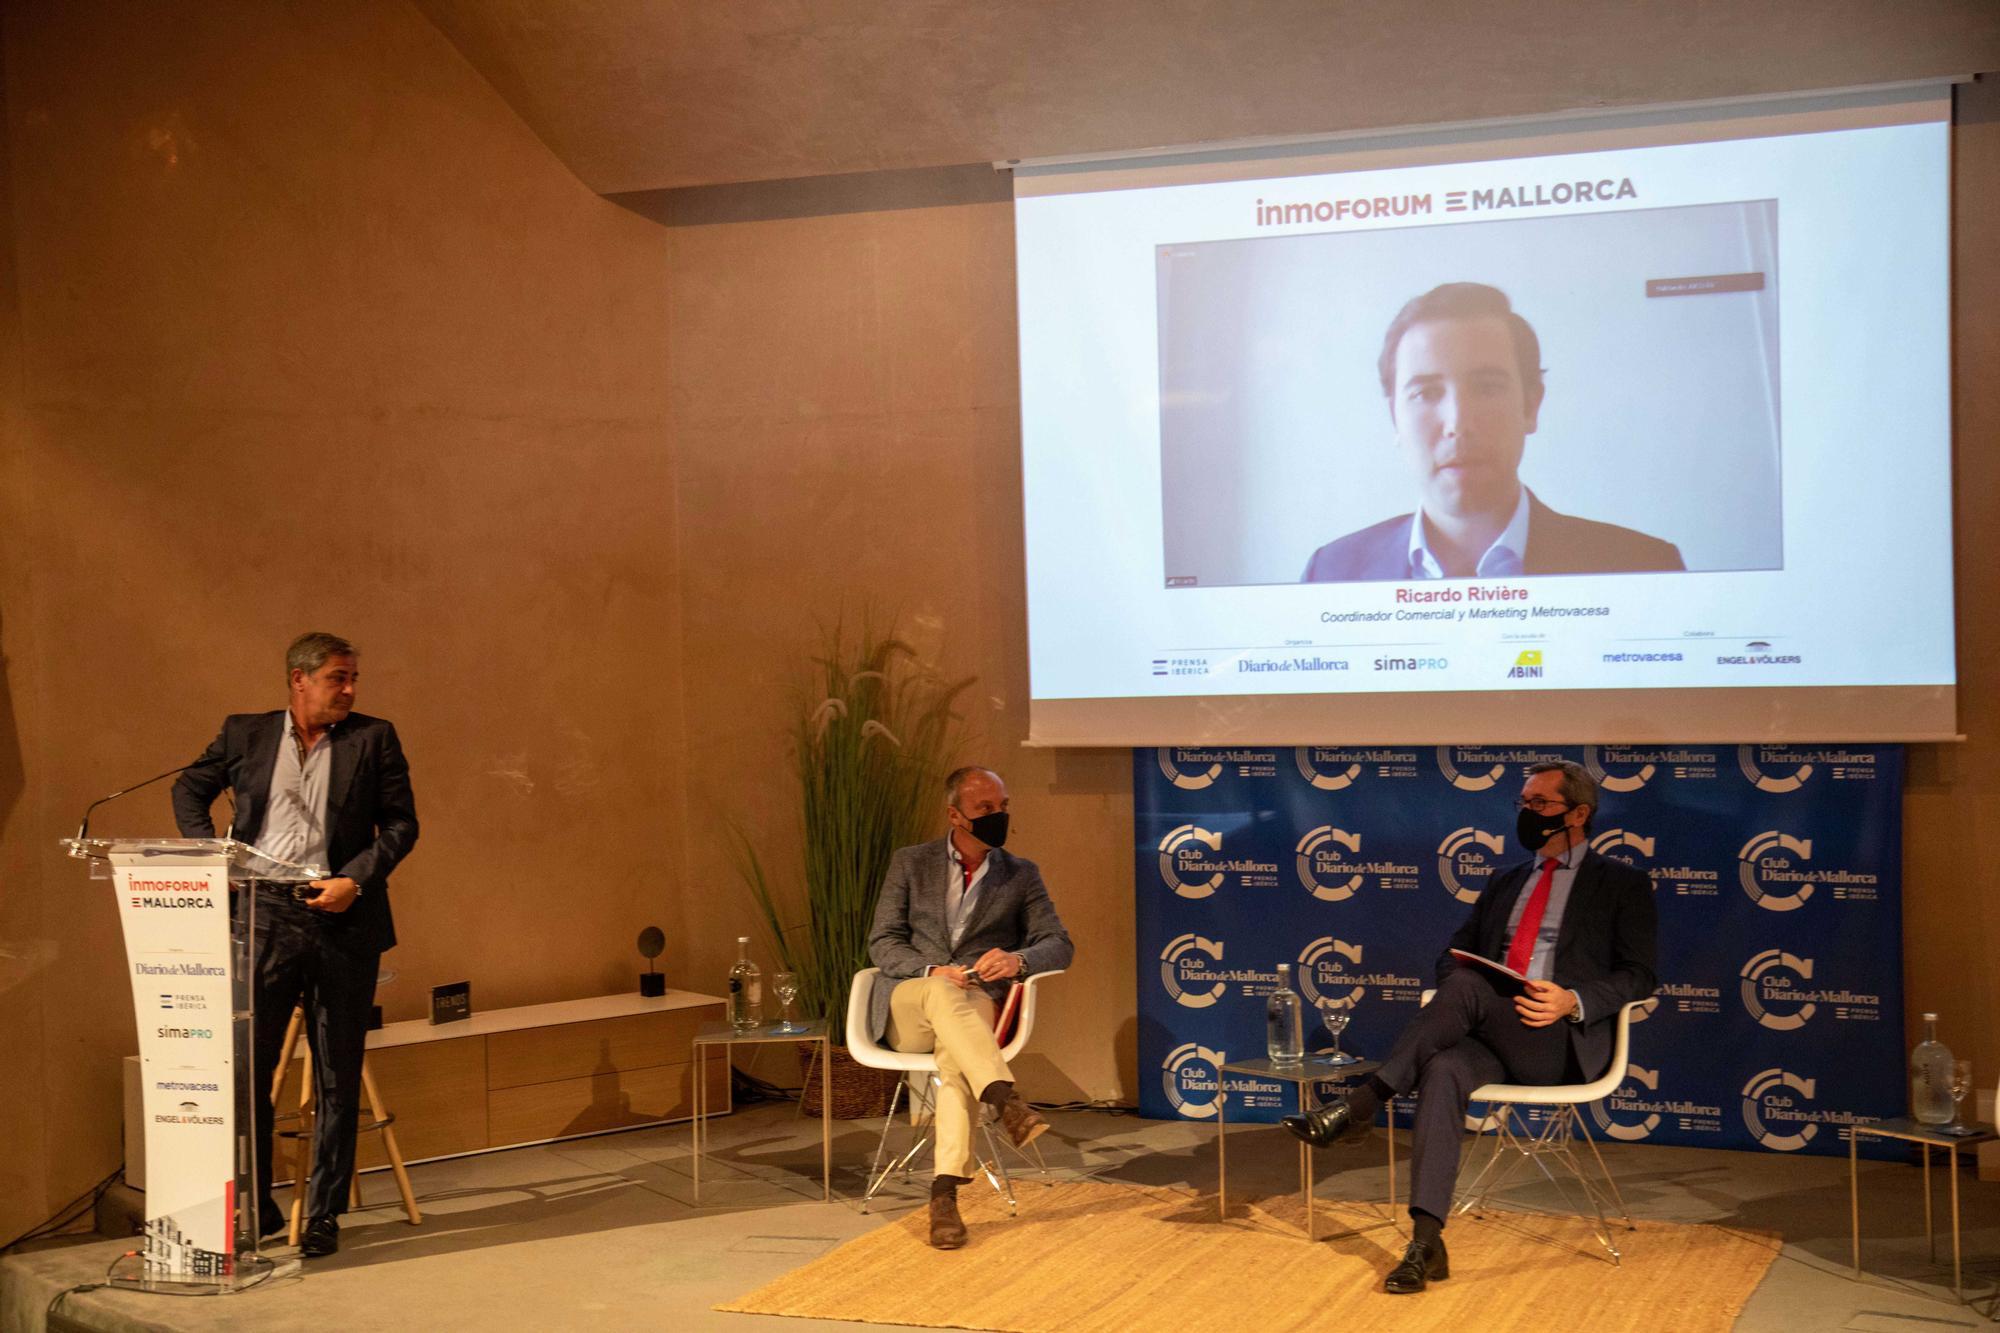 Segunda edición de Inmoforum en Club Diario de Mallorca: Perspectivas para el sector inmobiliario balear en 2021